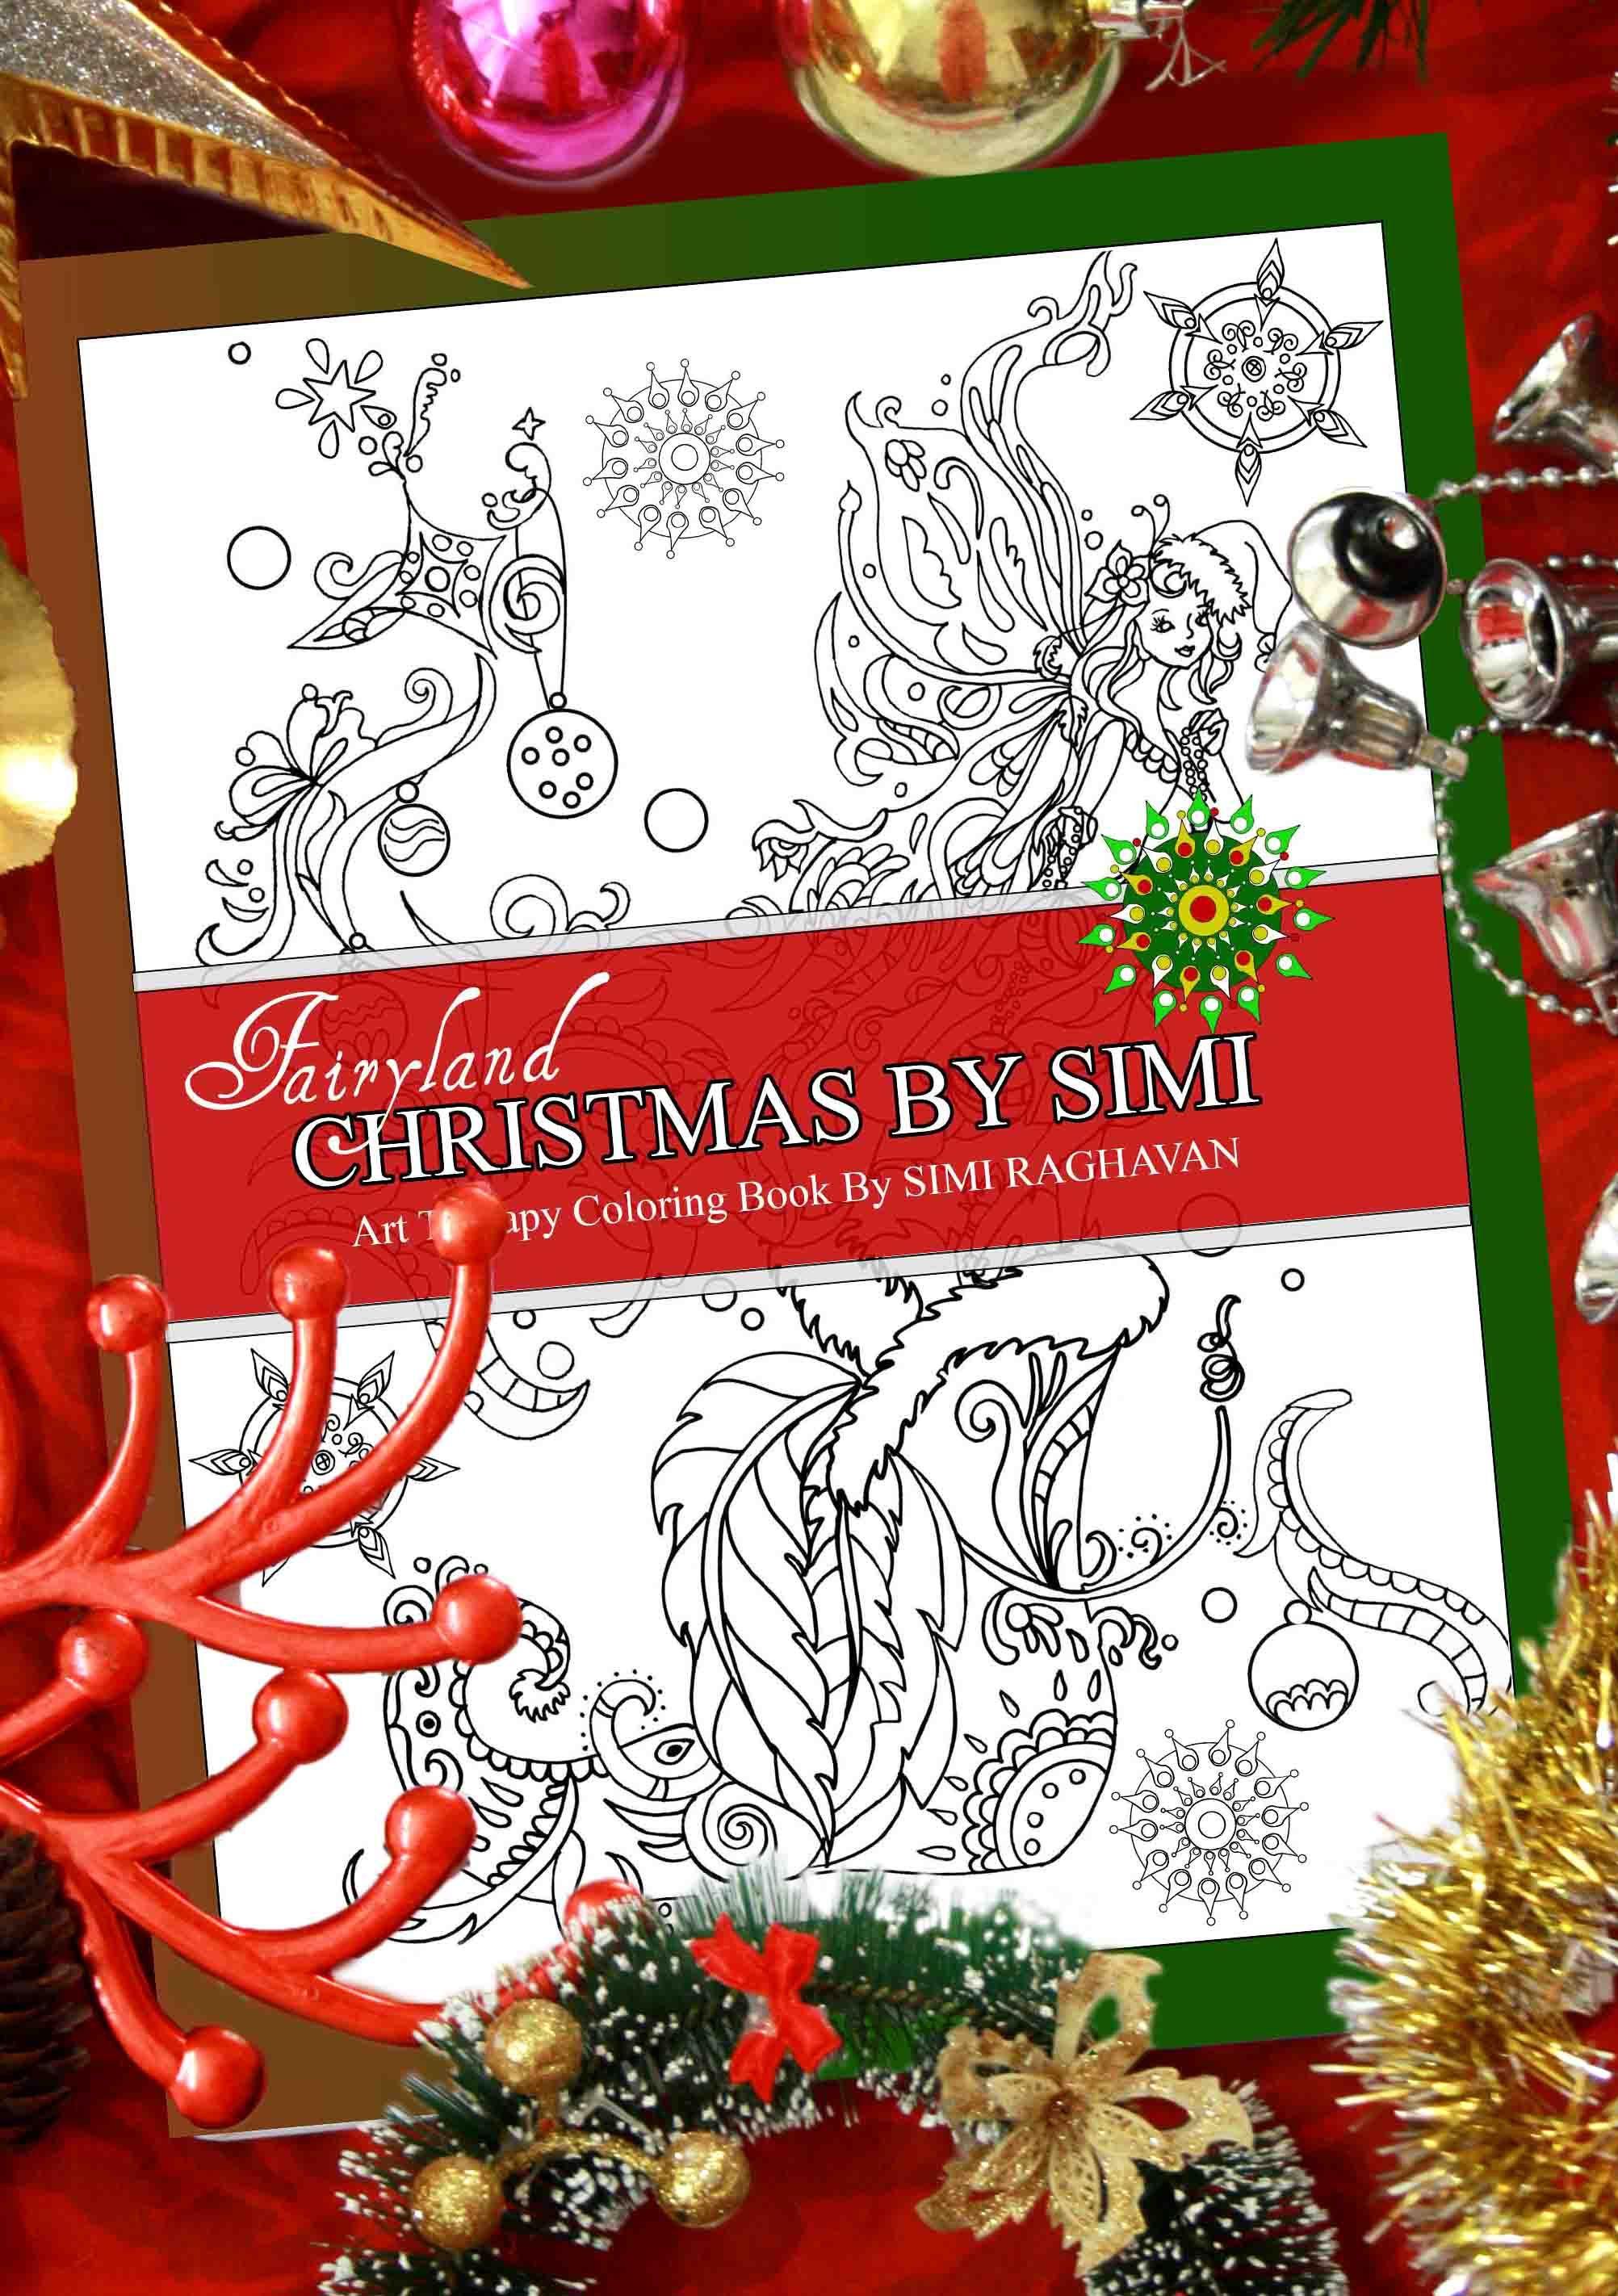 Fairyland Christmas By Simi Coloring BooksAdult